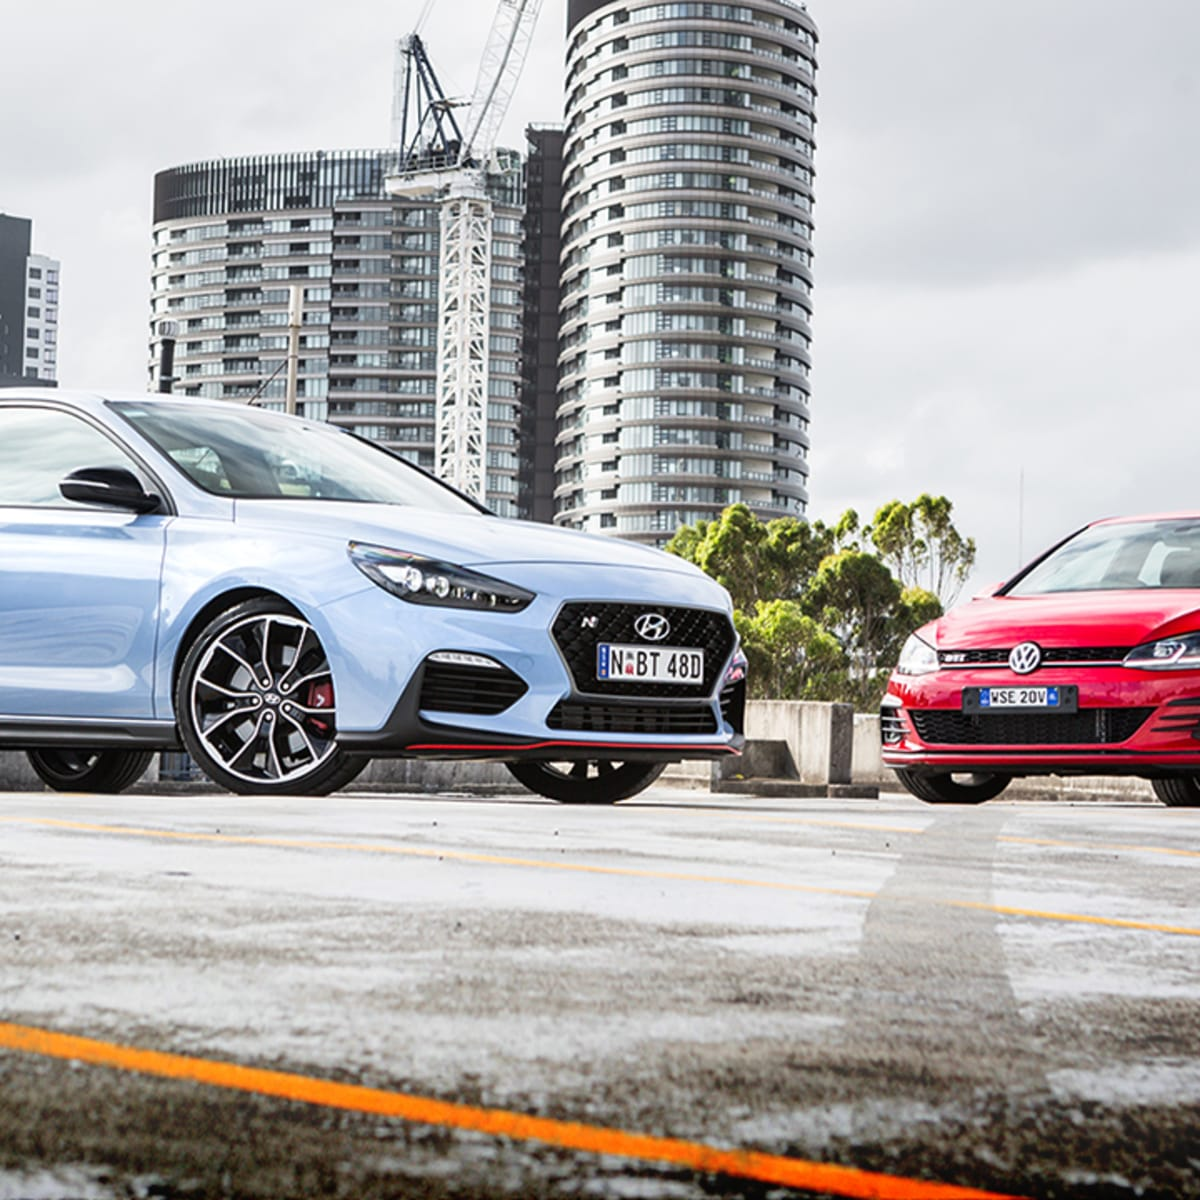 2018 Hyundai i30 N v Volkswagen Golf GTI 5-door comparison | CarAdvice